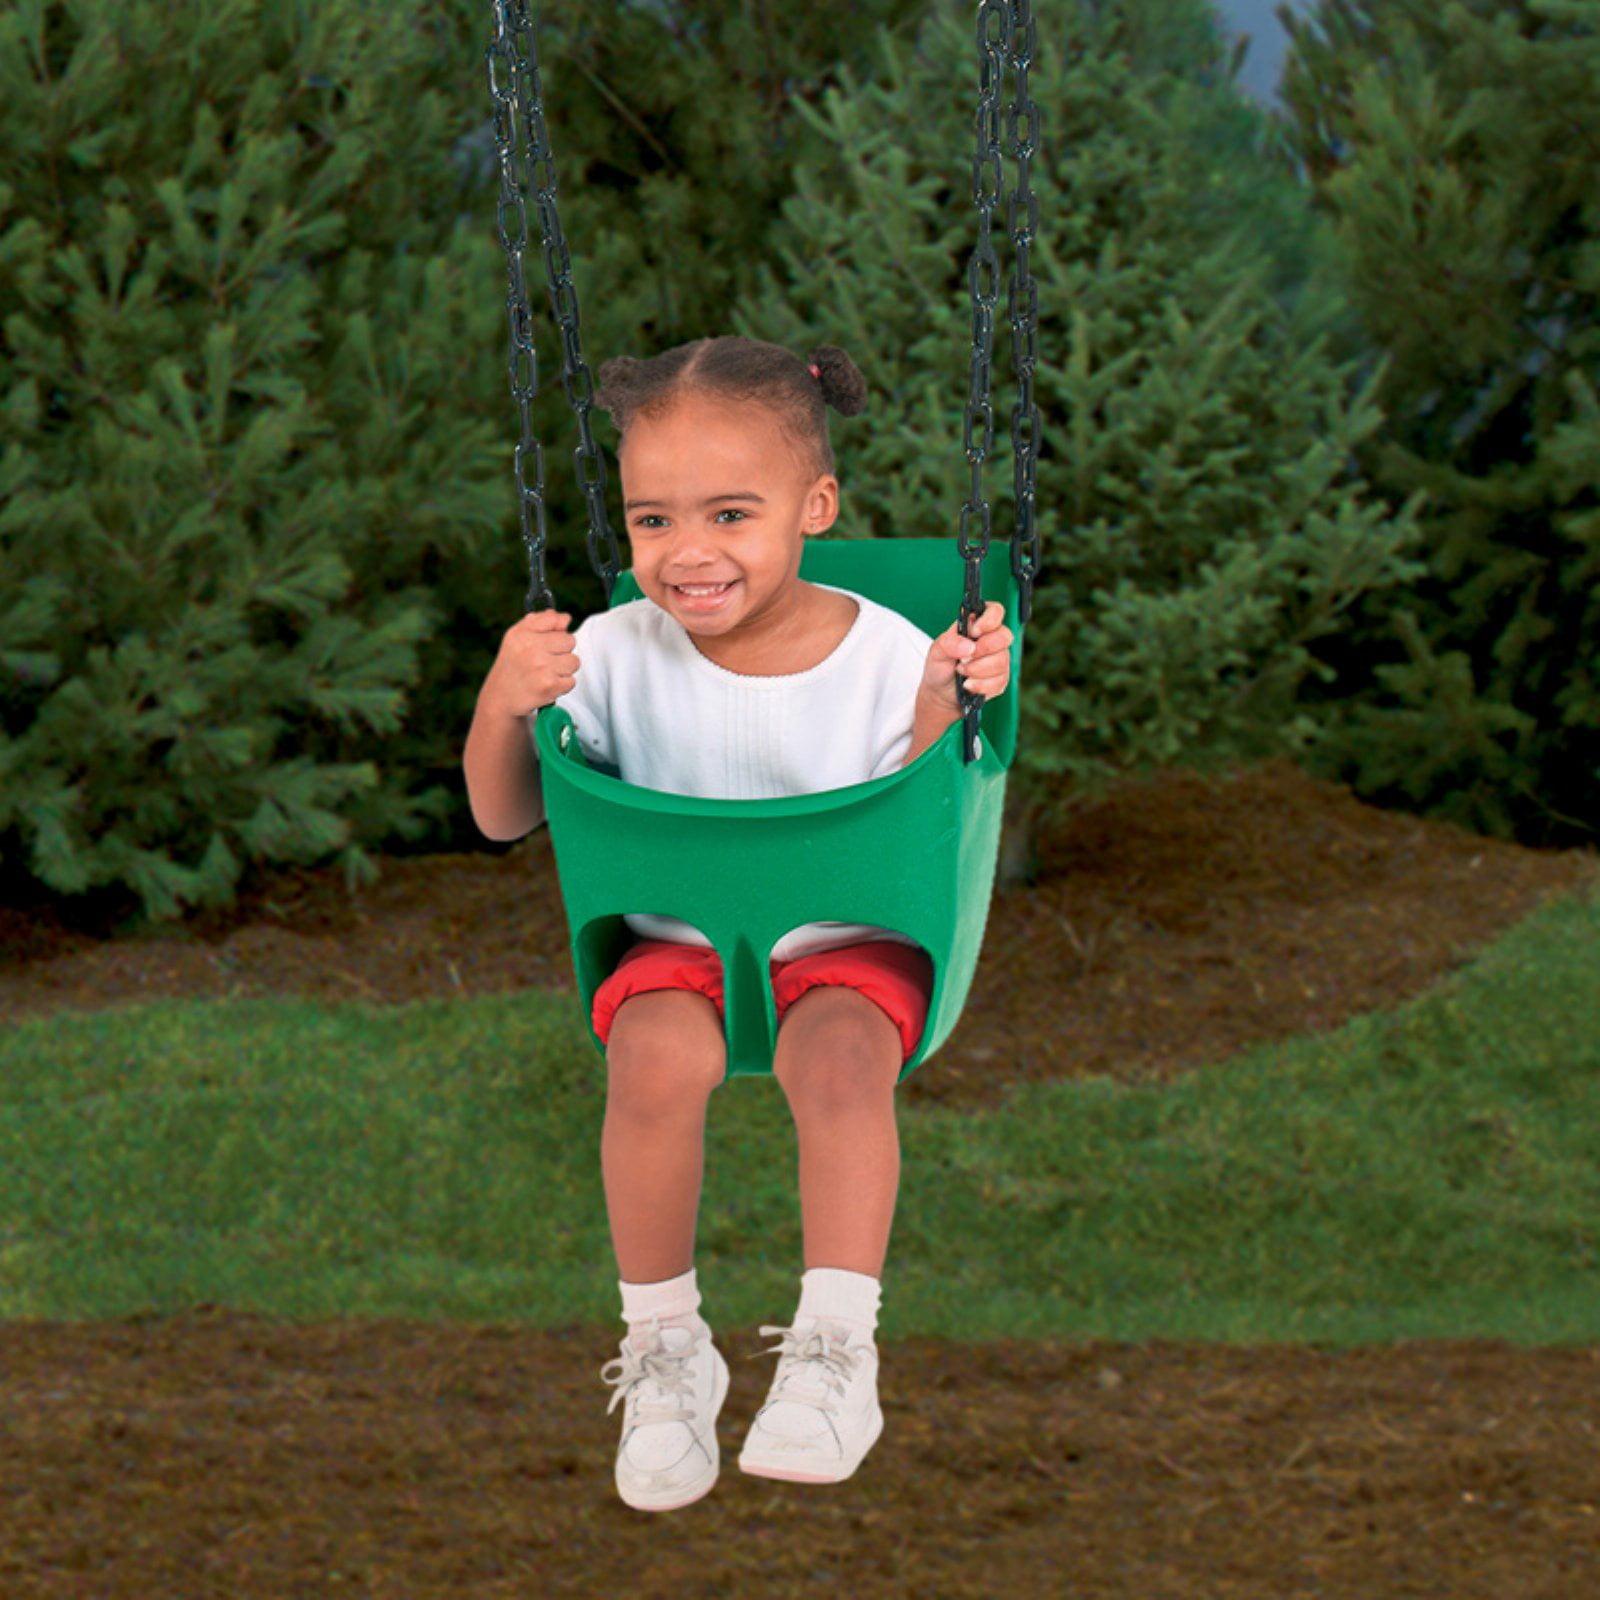 PlayStar Commercial-Grade Toddler Swing